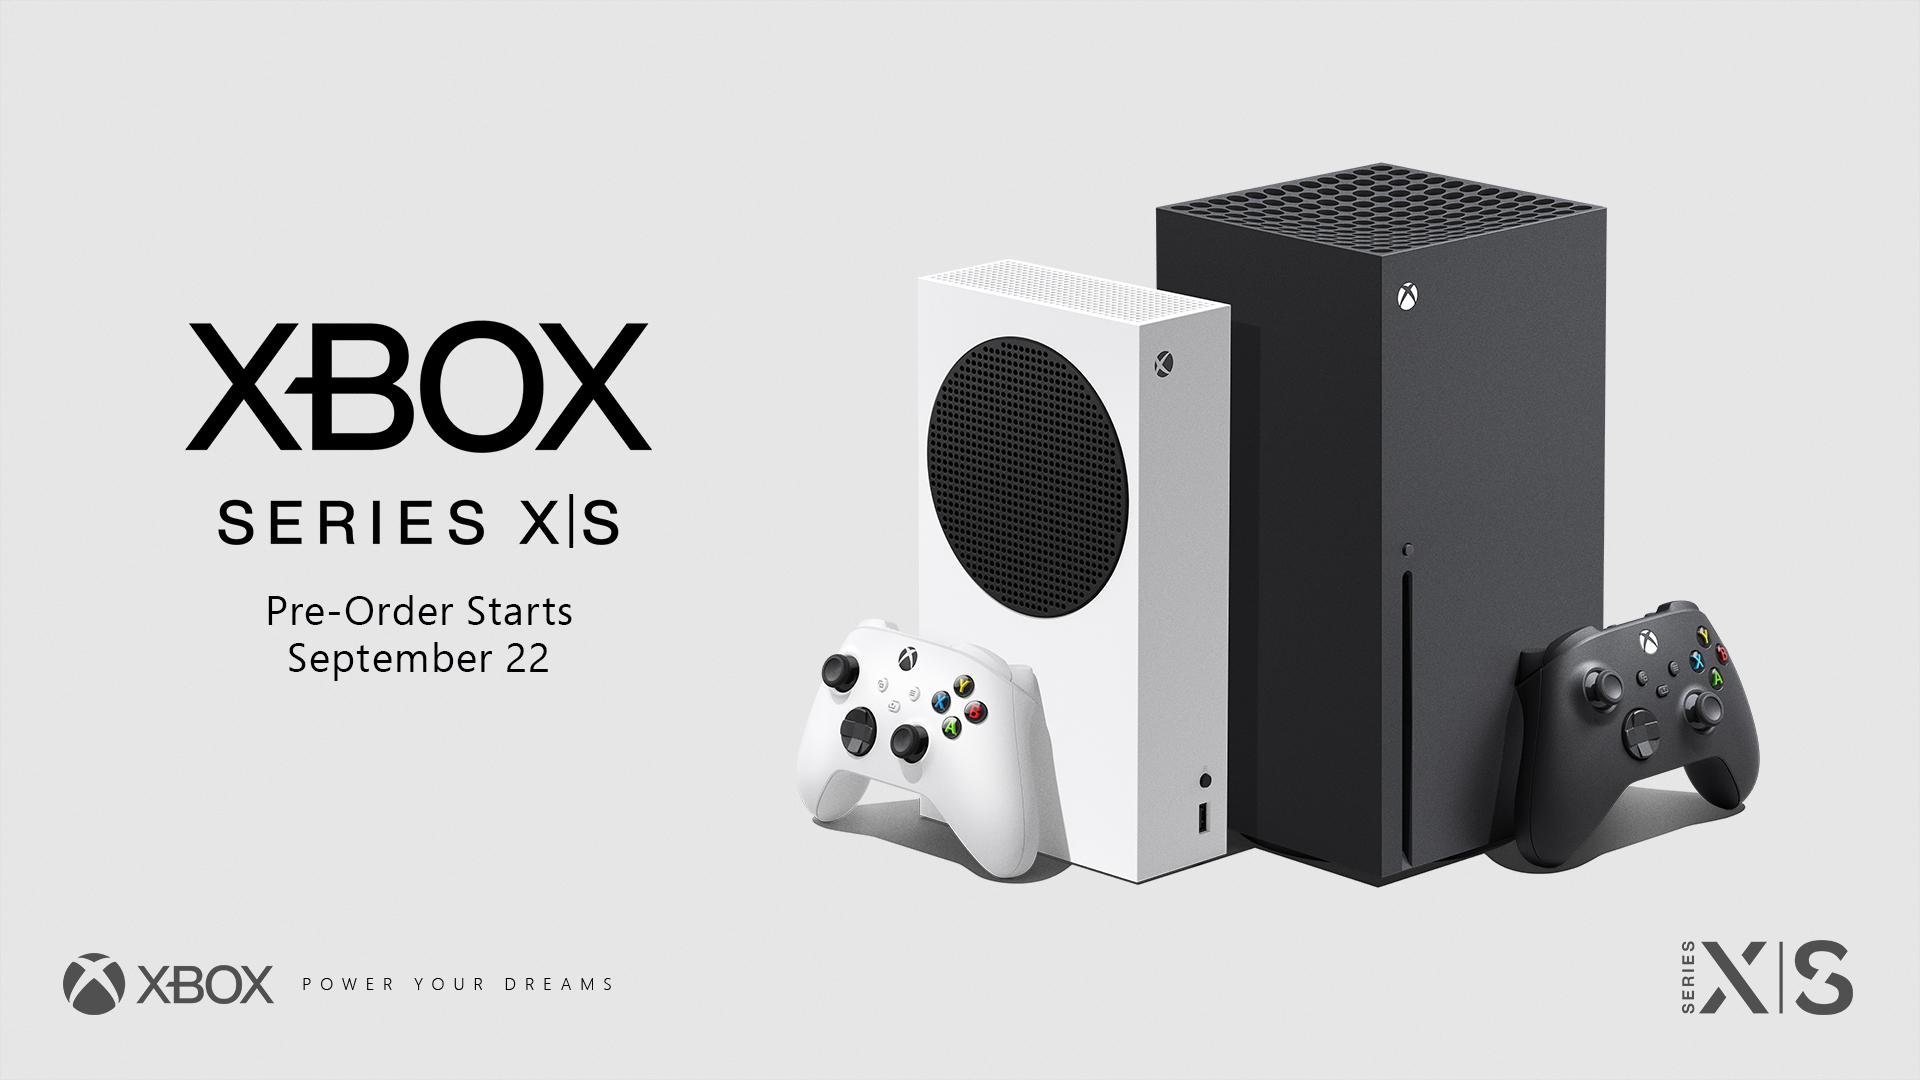 Xbox Series X S Preorder image